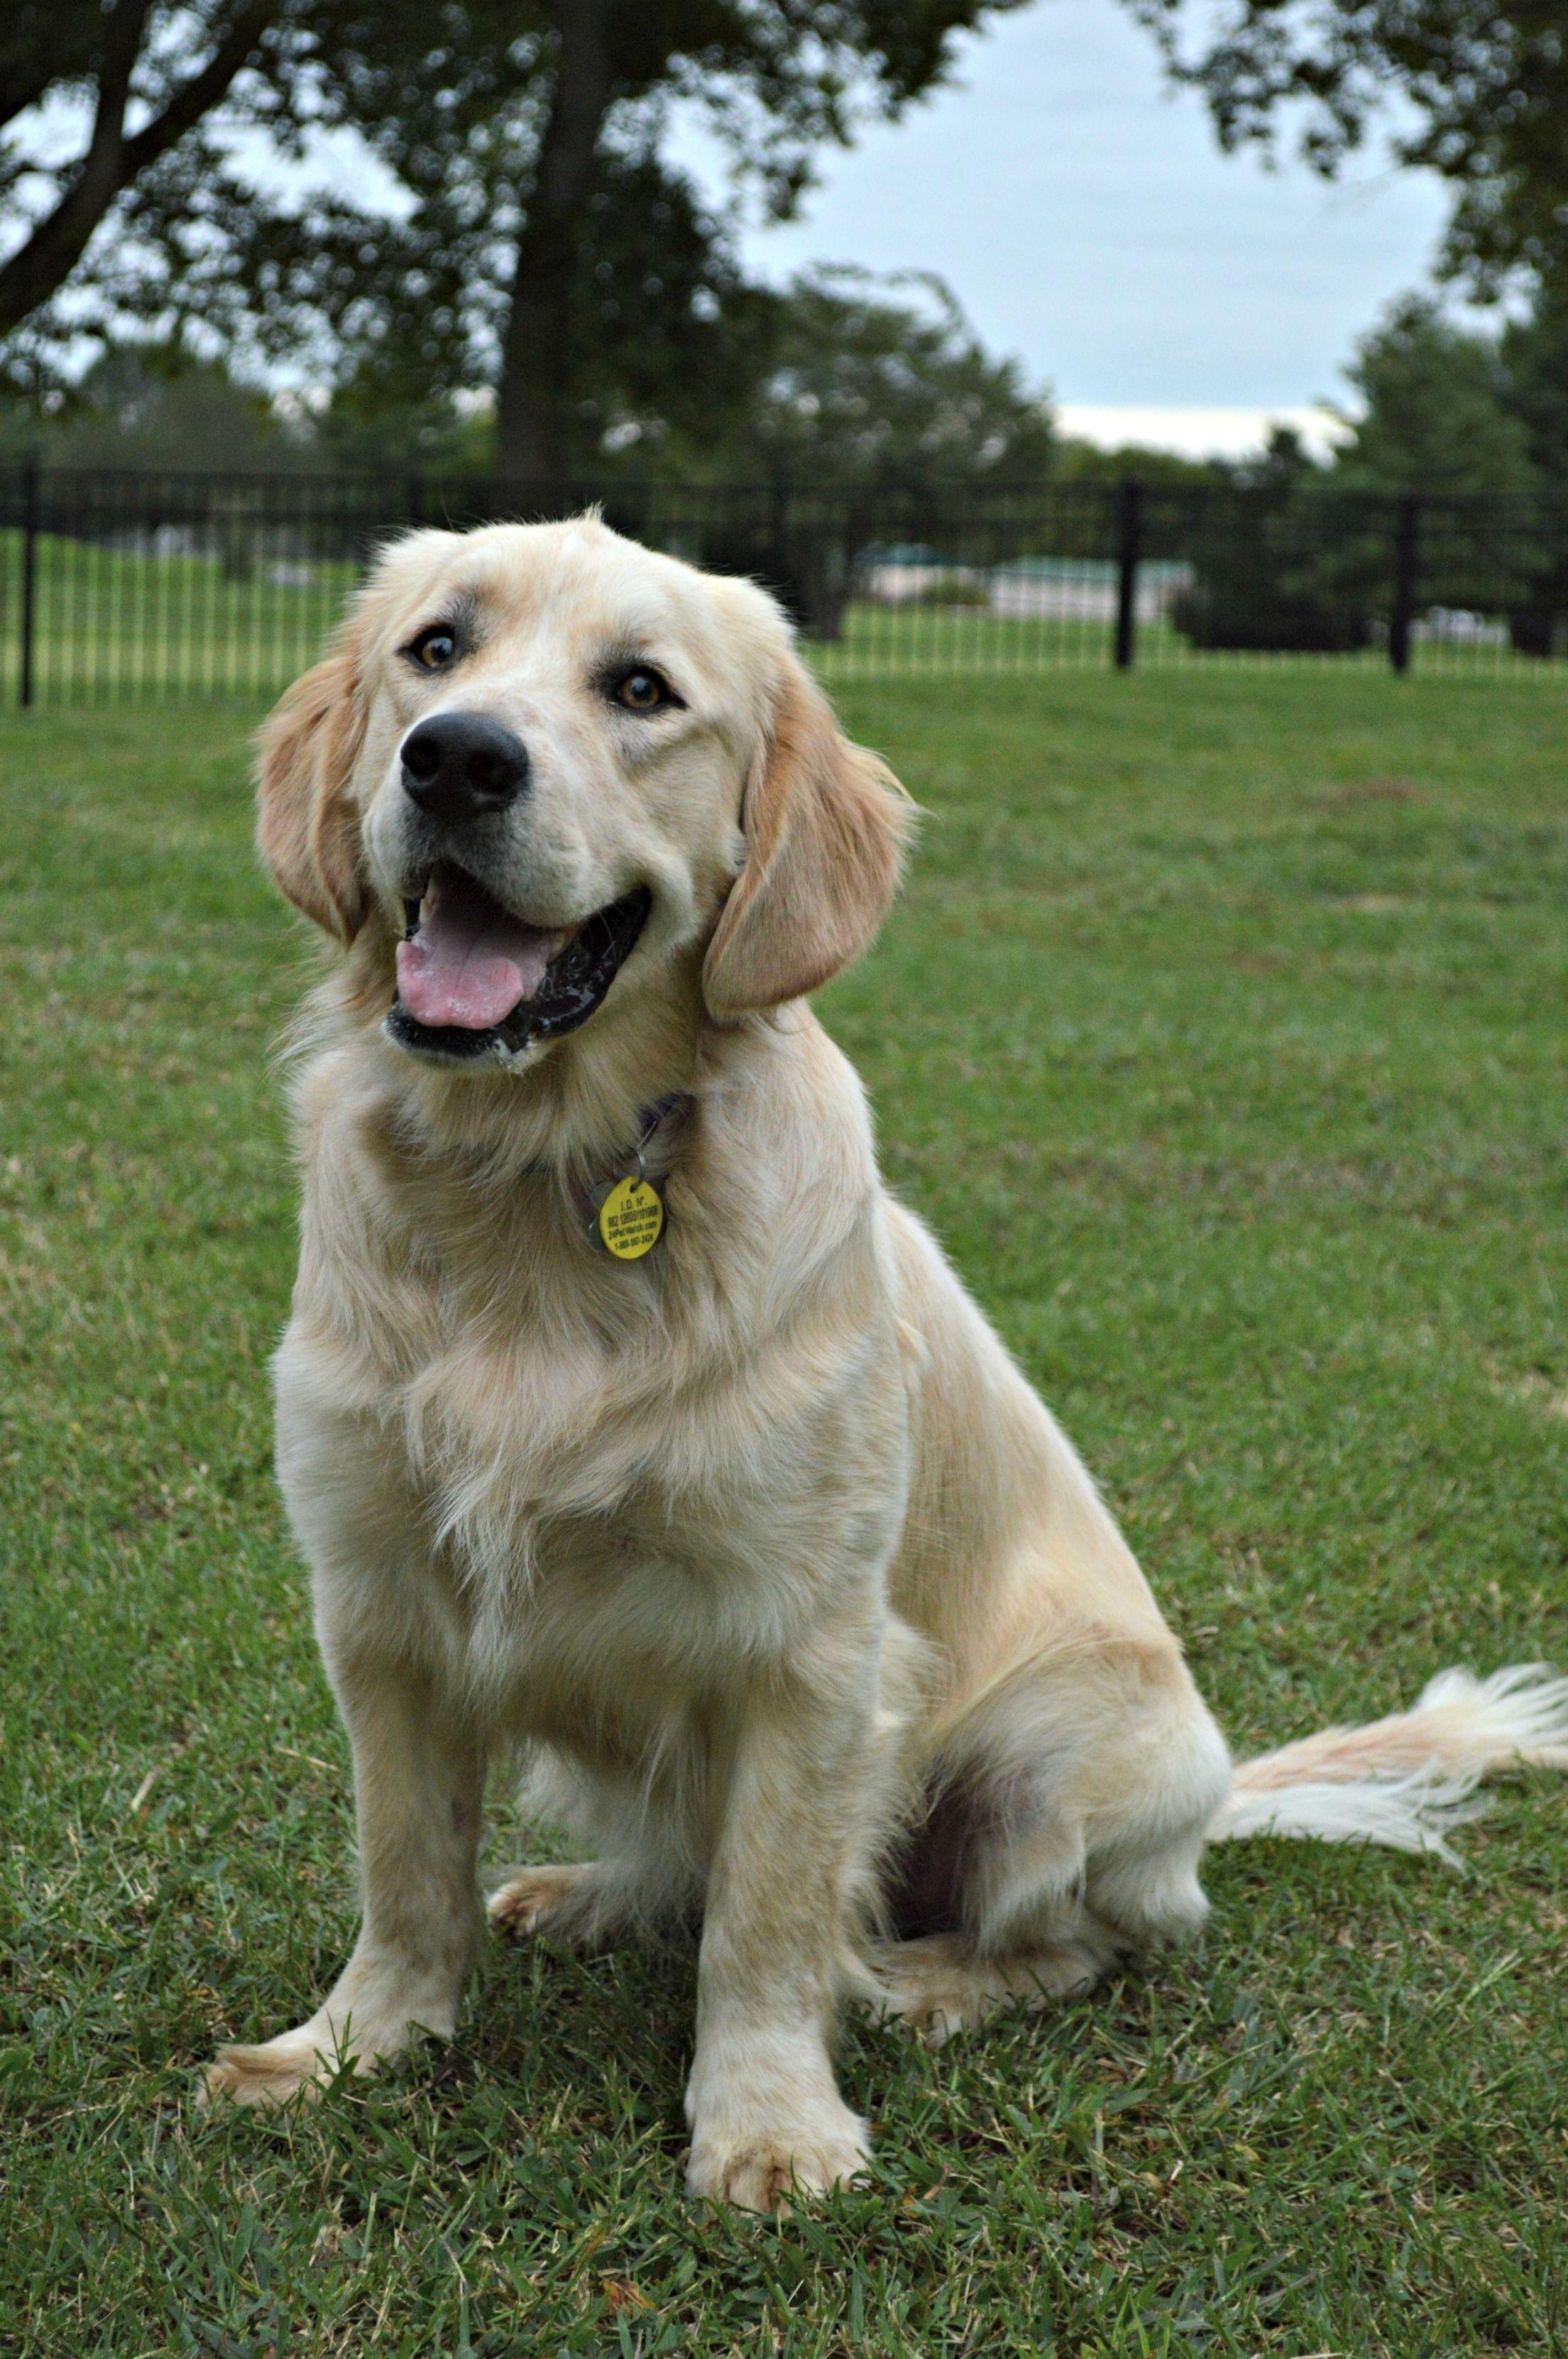 Pin By Paige Austin On Pets Golden Retriever Rescue Golden